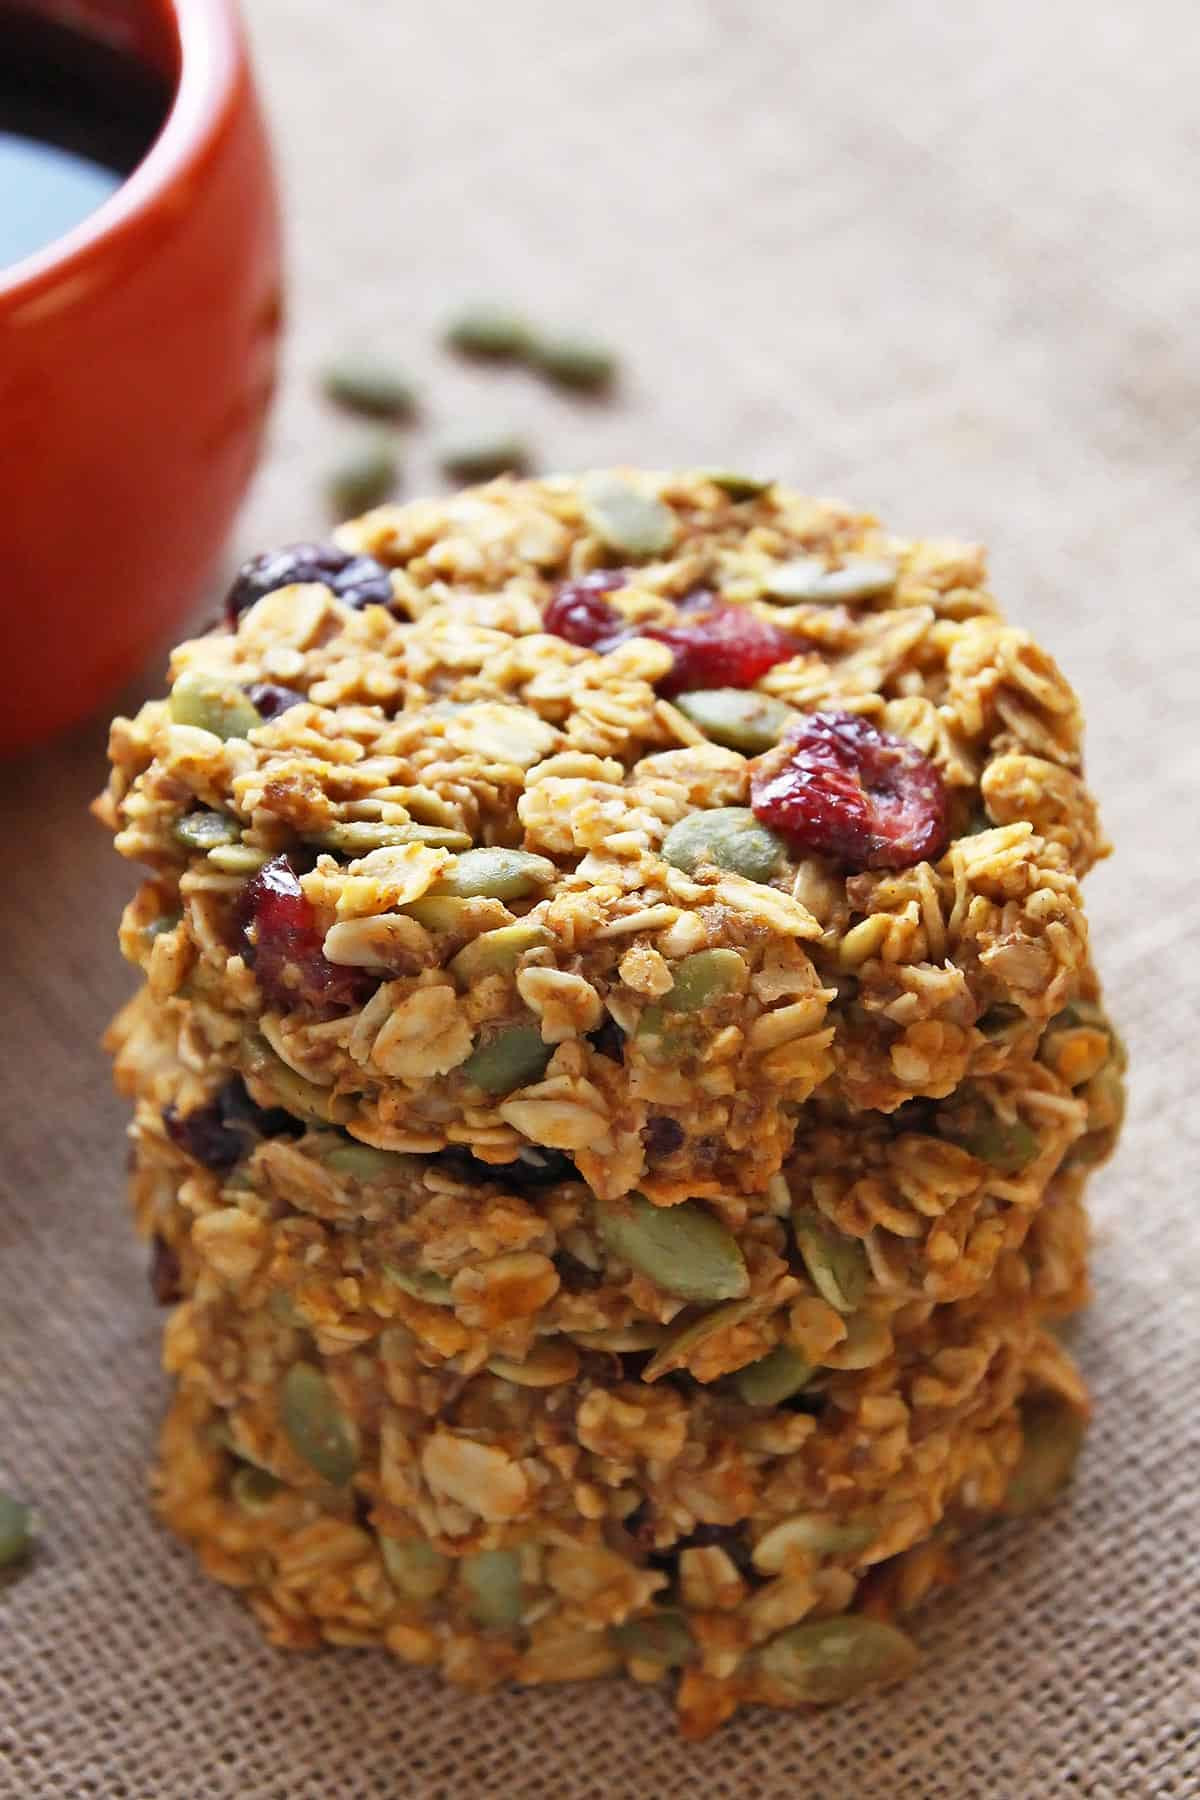 Healthy Breakfast Cookies And Bars  healthy breakfast cookies and bars